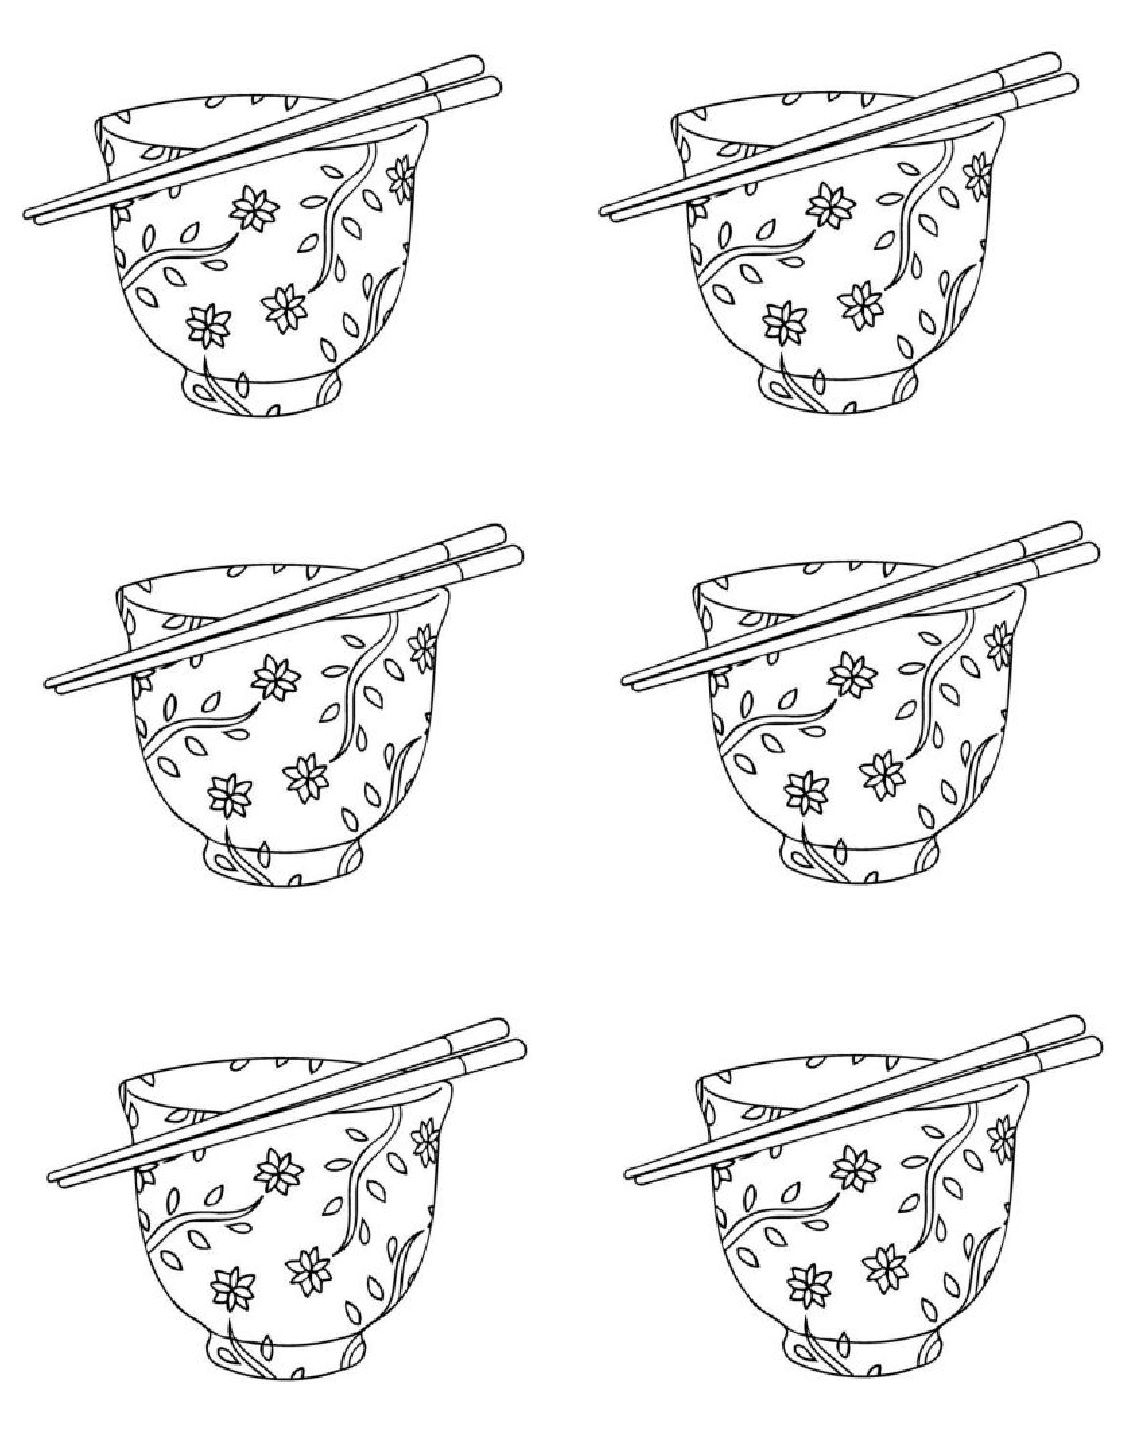 Pin Van Juf Petra Op Thema China Kleuters Theme China Preschool Chine Theme Maternelle Rond De Wereld Thema Japanse Kunst